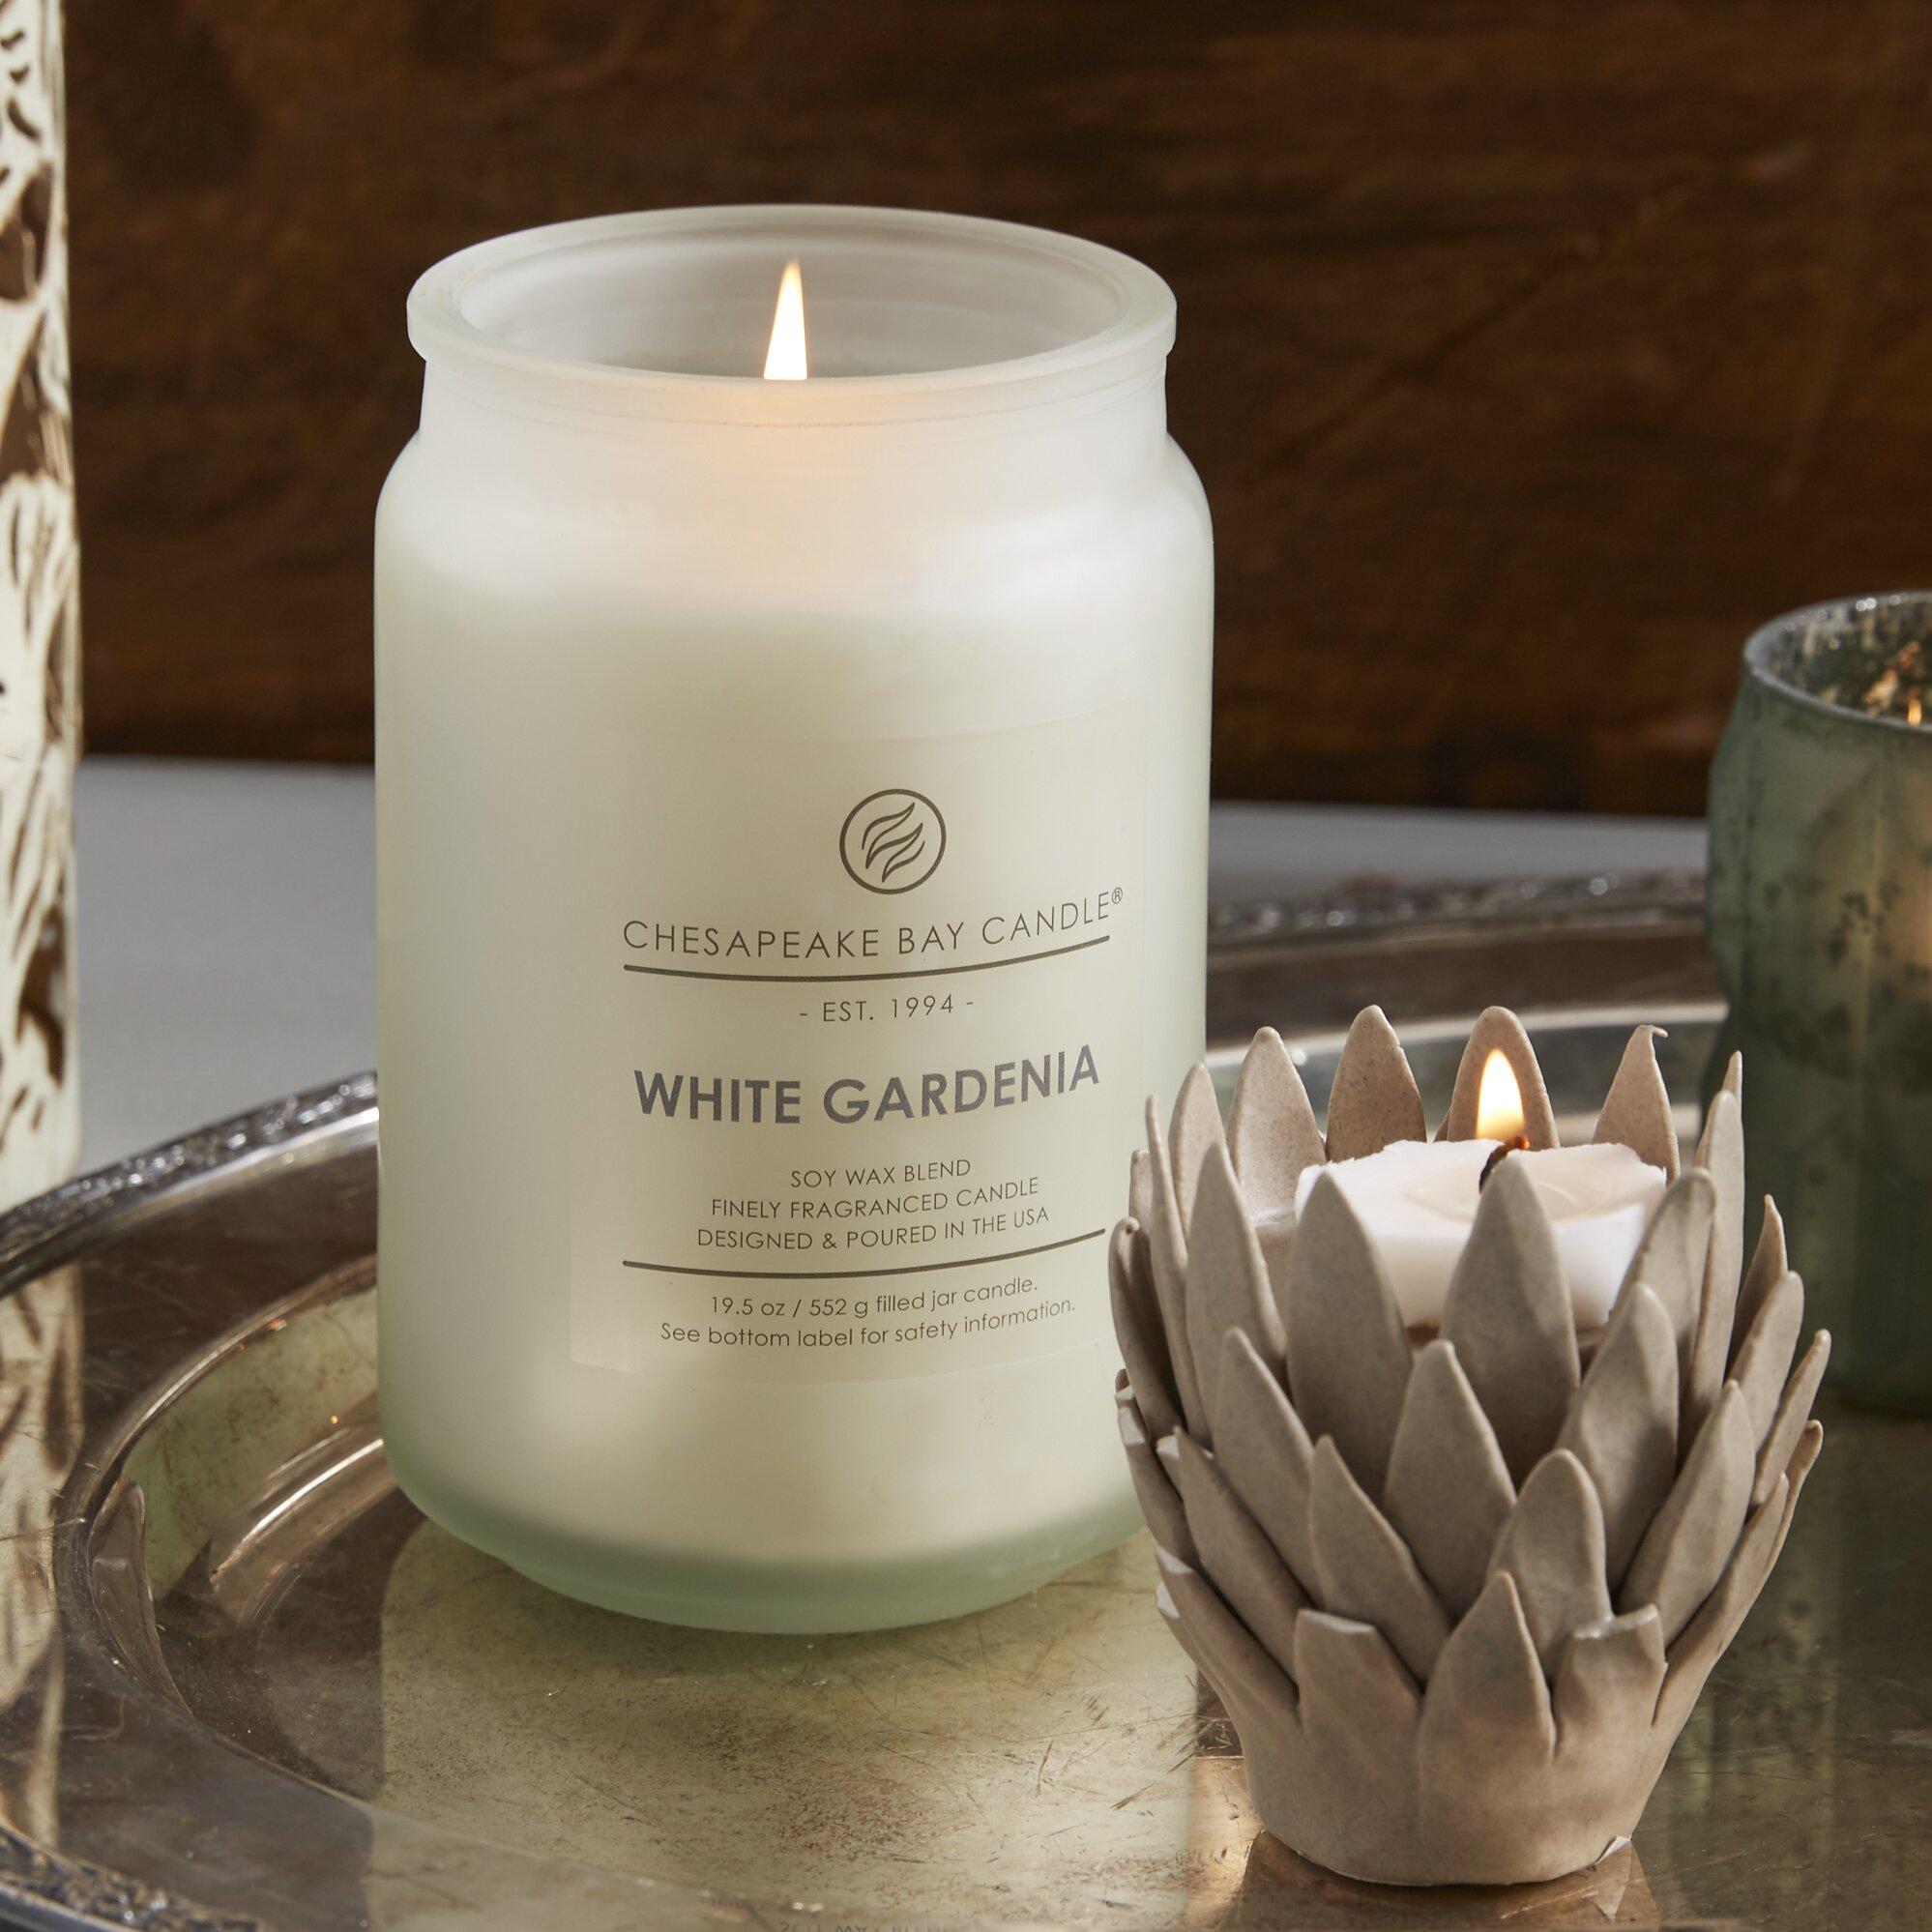 Chesapeake Bay Candle Hertitage White Gardenia Jar Candle ...